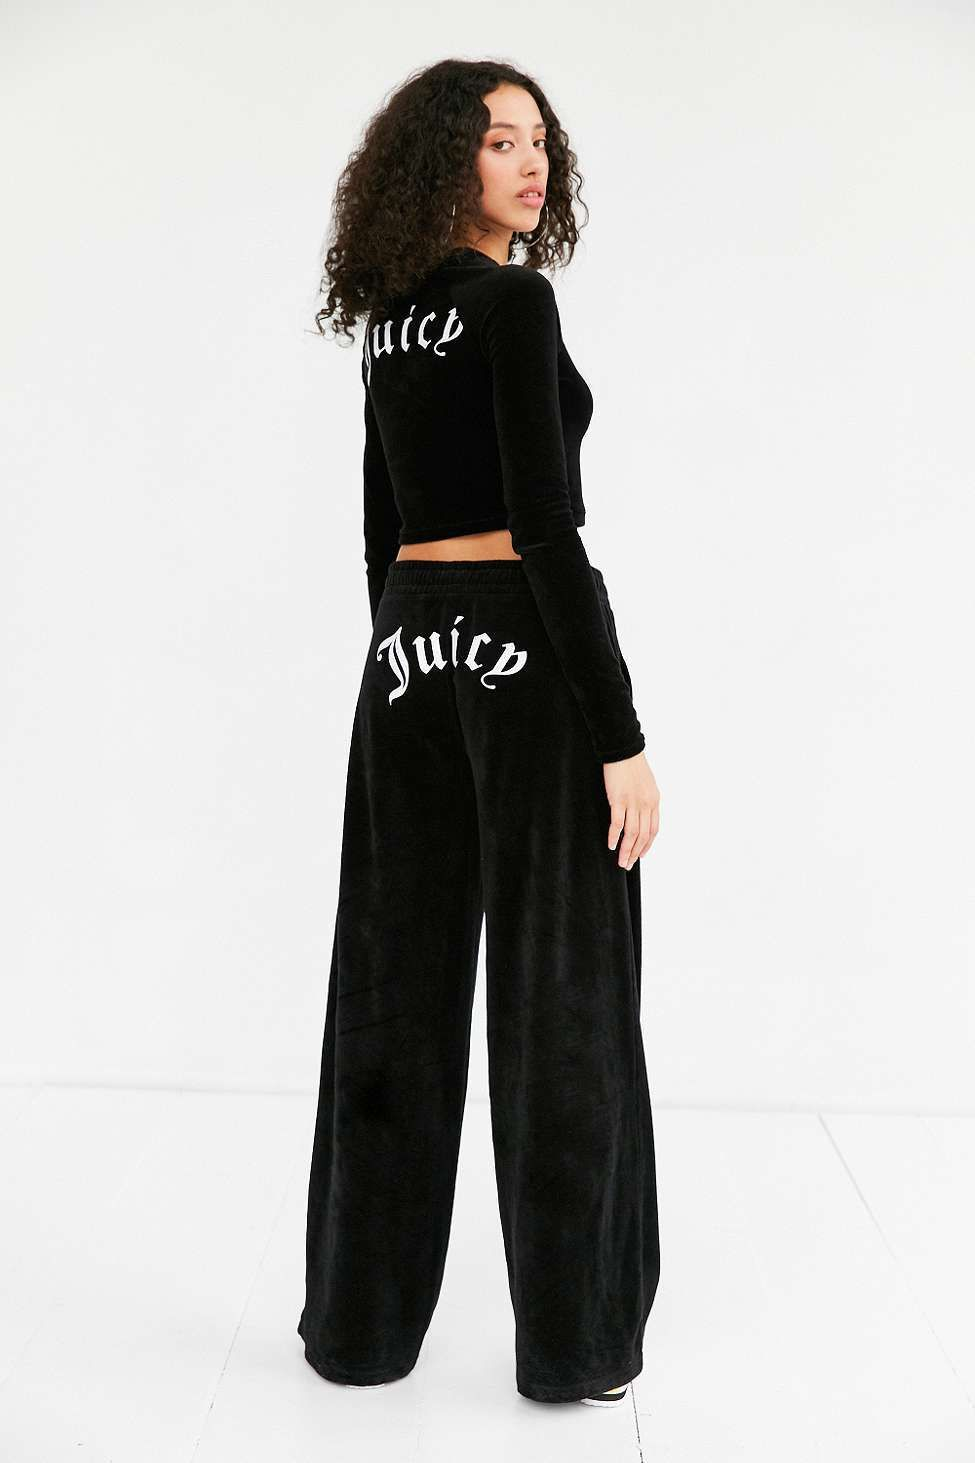 d15bef73add2 Spring Style Inspiration: Denim, Silk & Sportswear | My Style ...